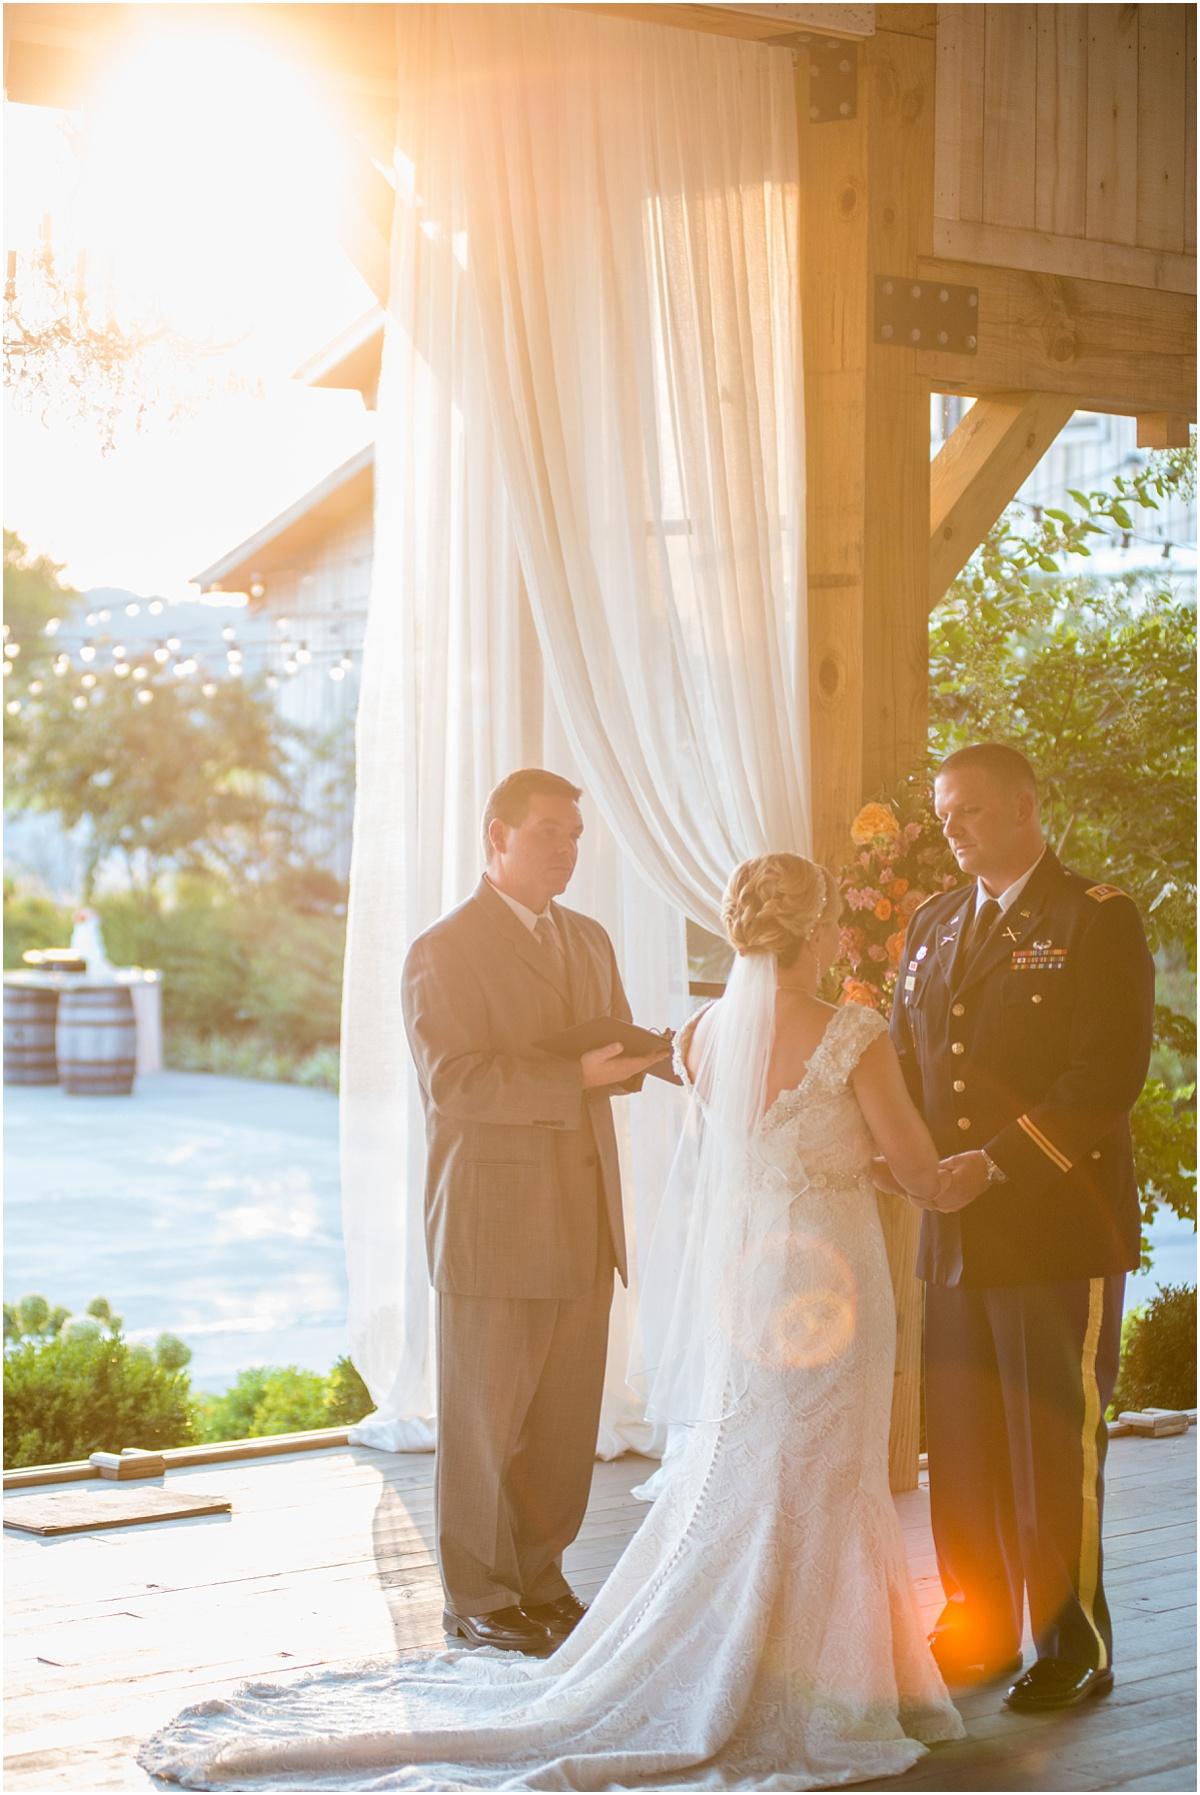 Greg Smit Photography Nashville wedding photographer Mint Springs Farm  20